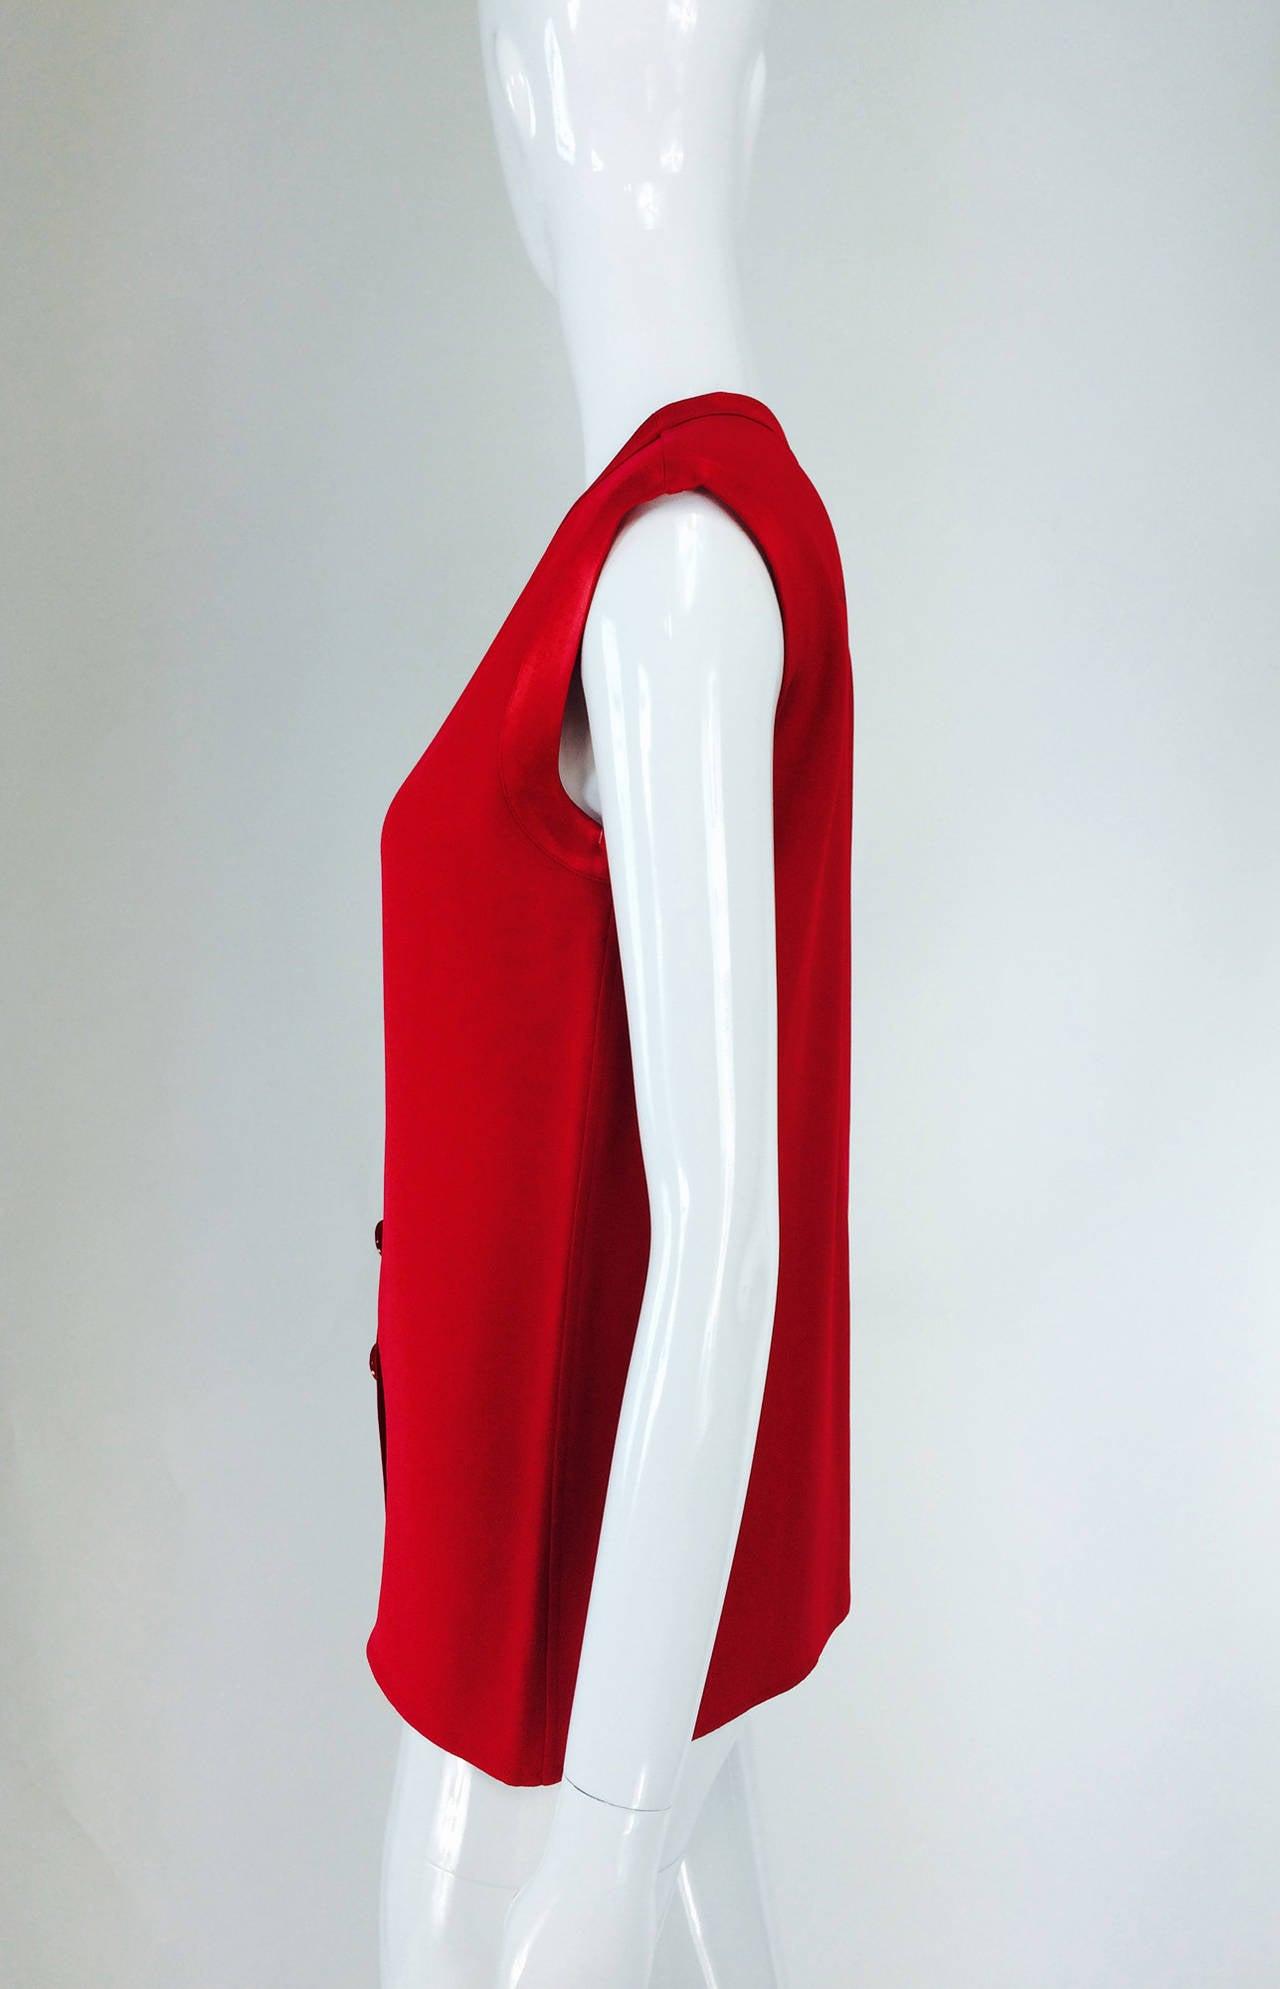 Yves St Laurent YSL Rive Gauche red satin back crepe sleeveless top 6